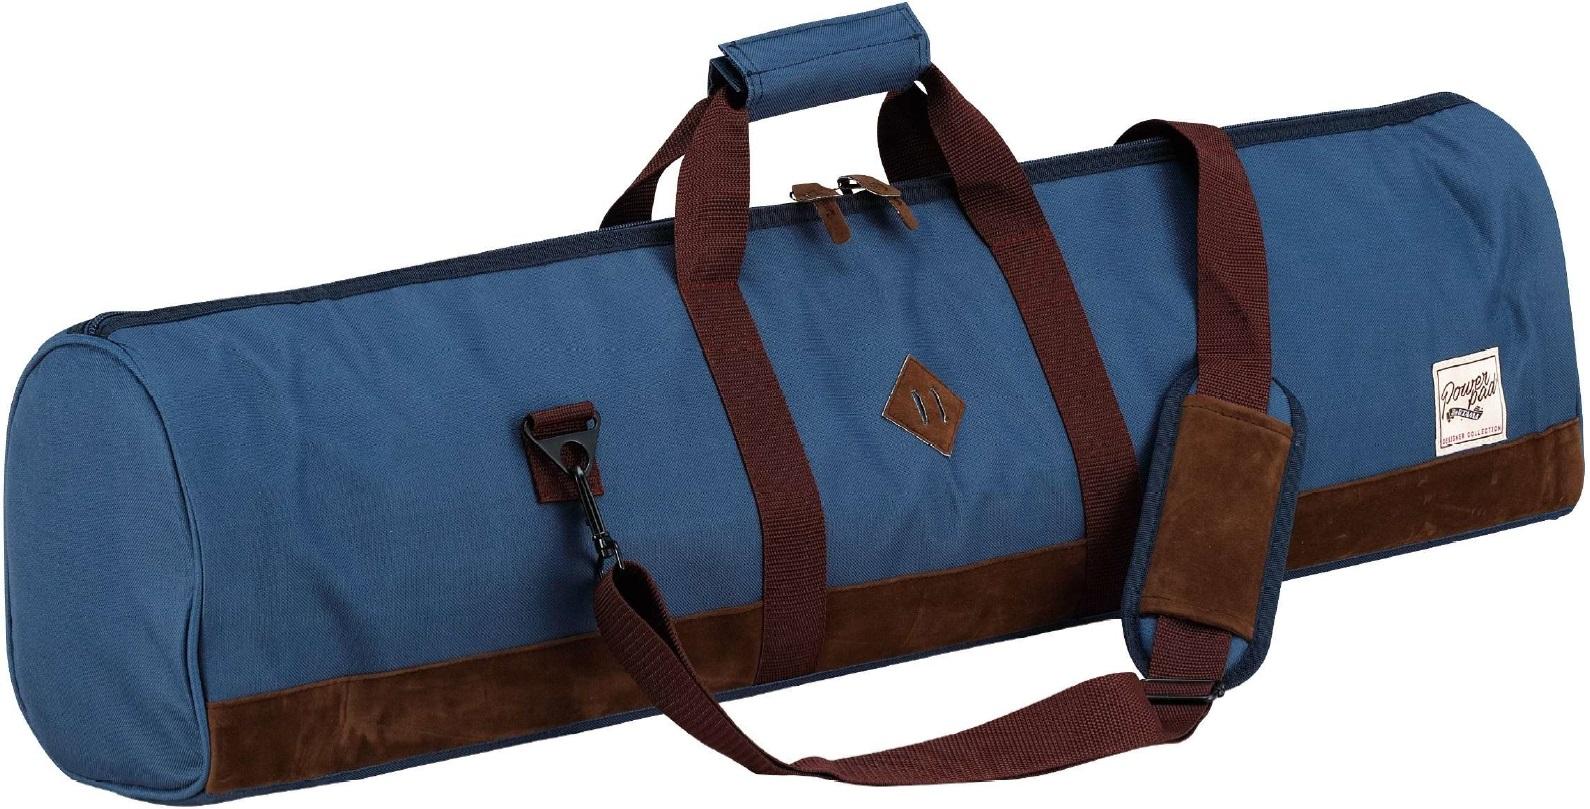 Tama Powerpad Designer Hardware Bag - Navy Blue